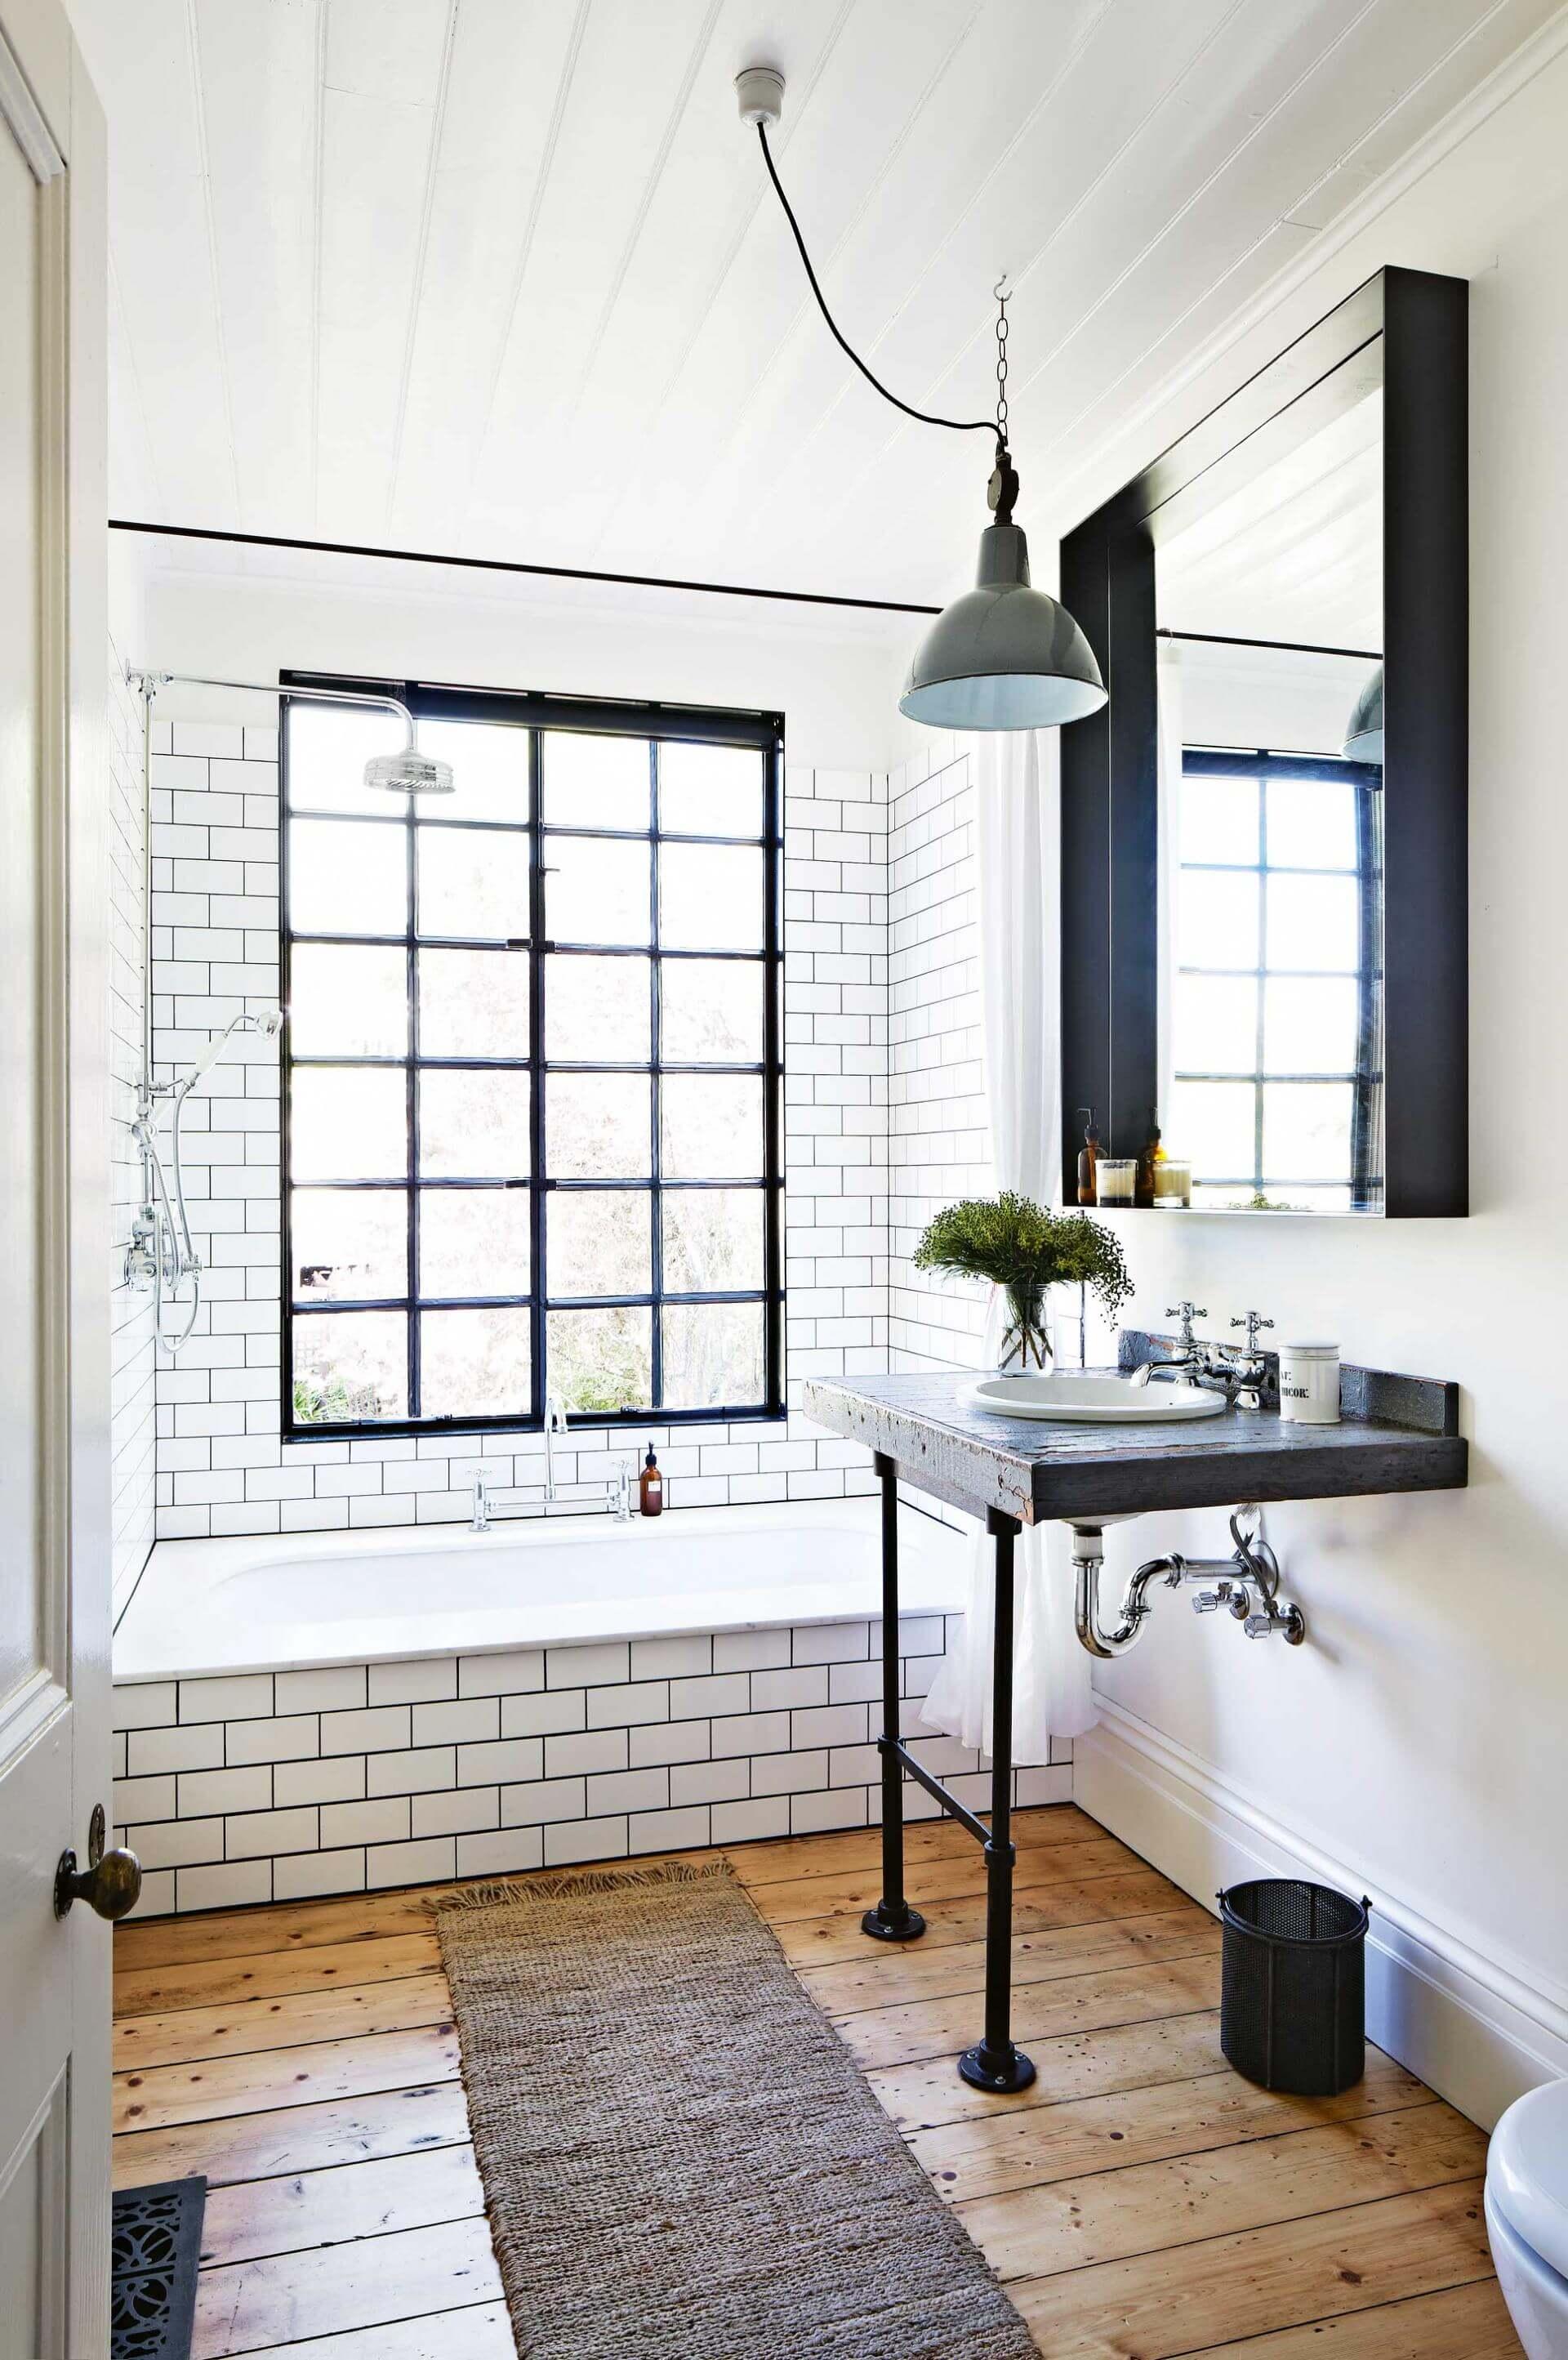 10 stunning industrial bathroom ideas